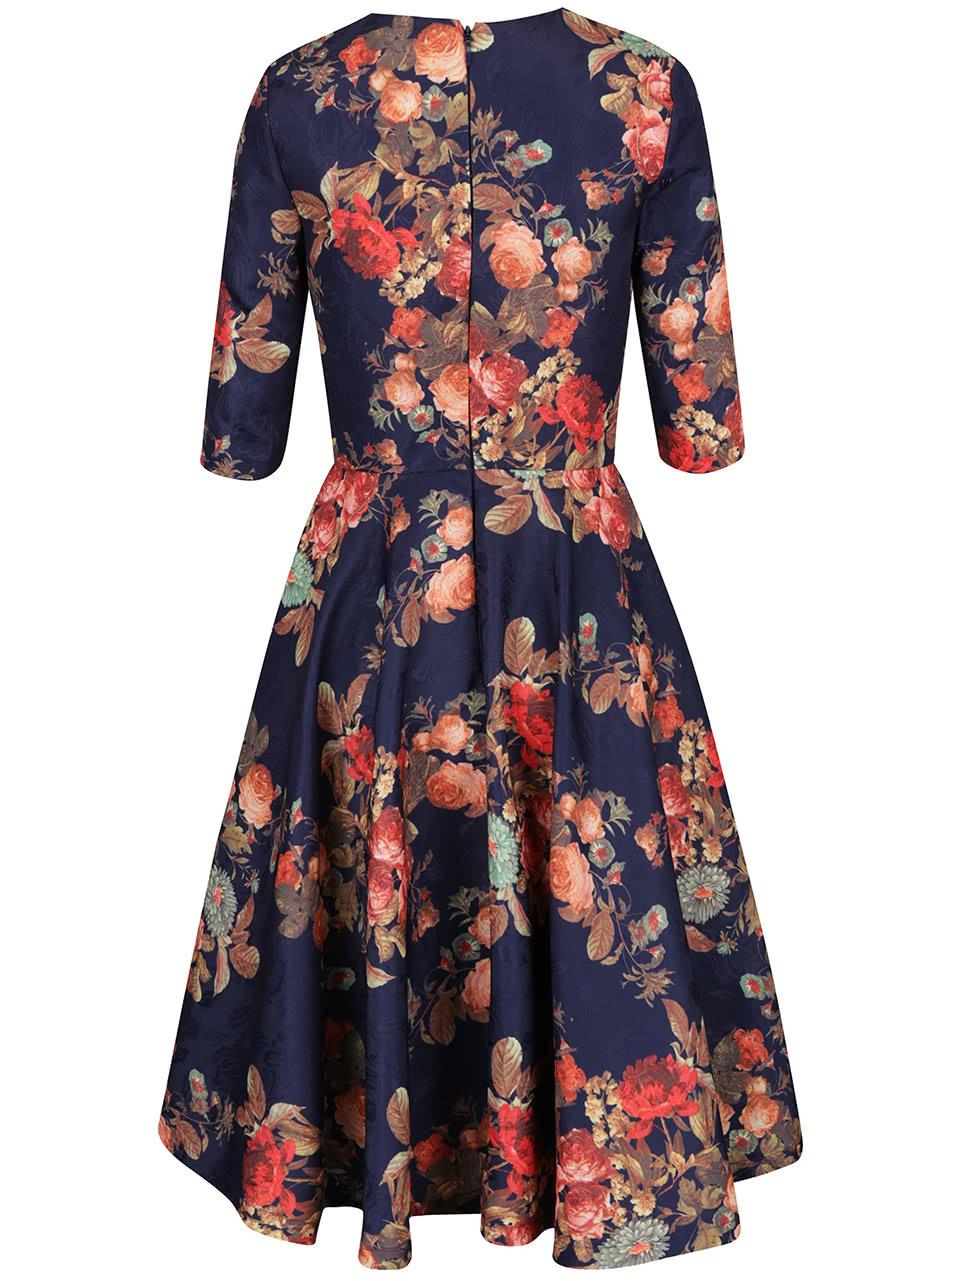 Tmavomodré kvetované midi šaty s 3 4 rukávmi Chi Chi London Megan ... 55dfe19391d